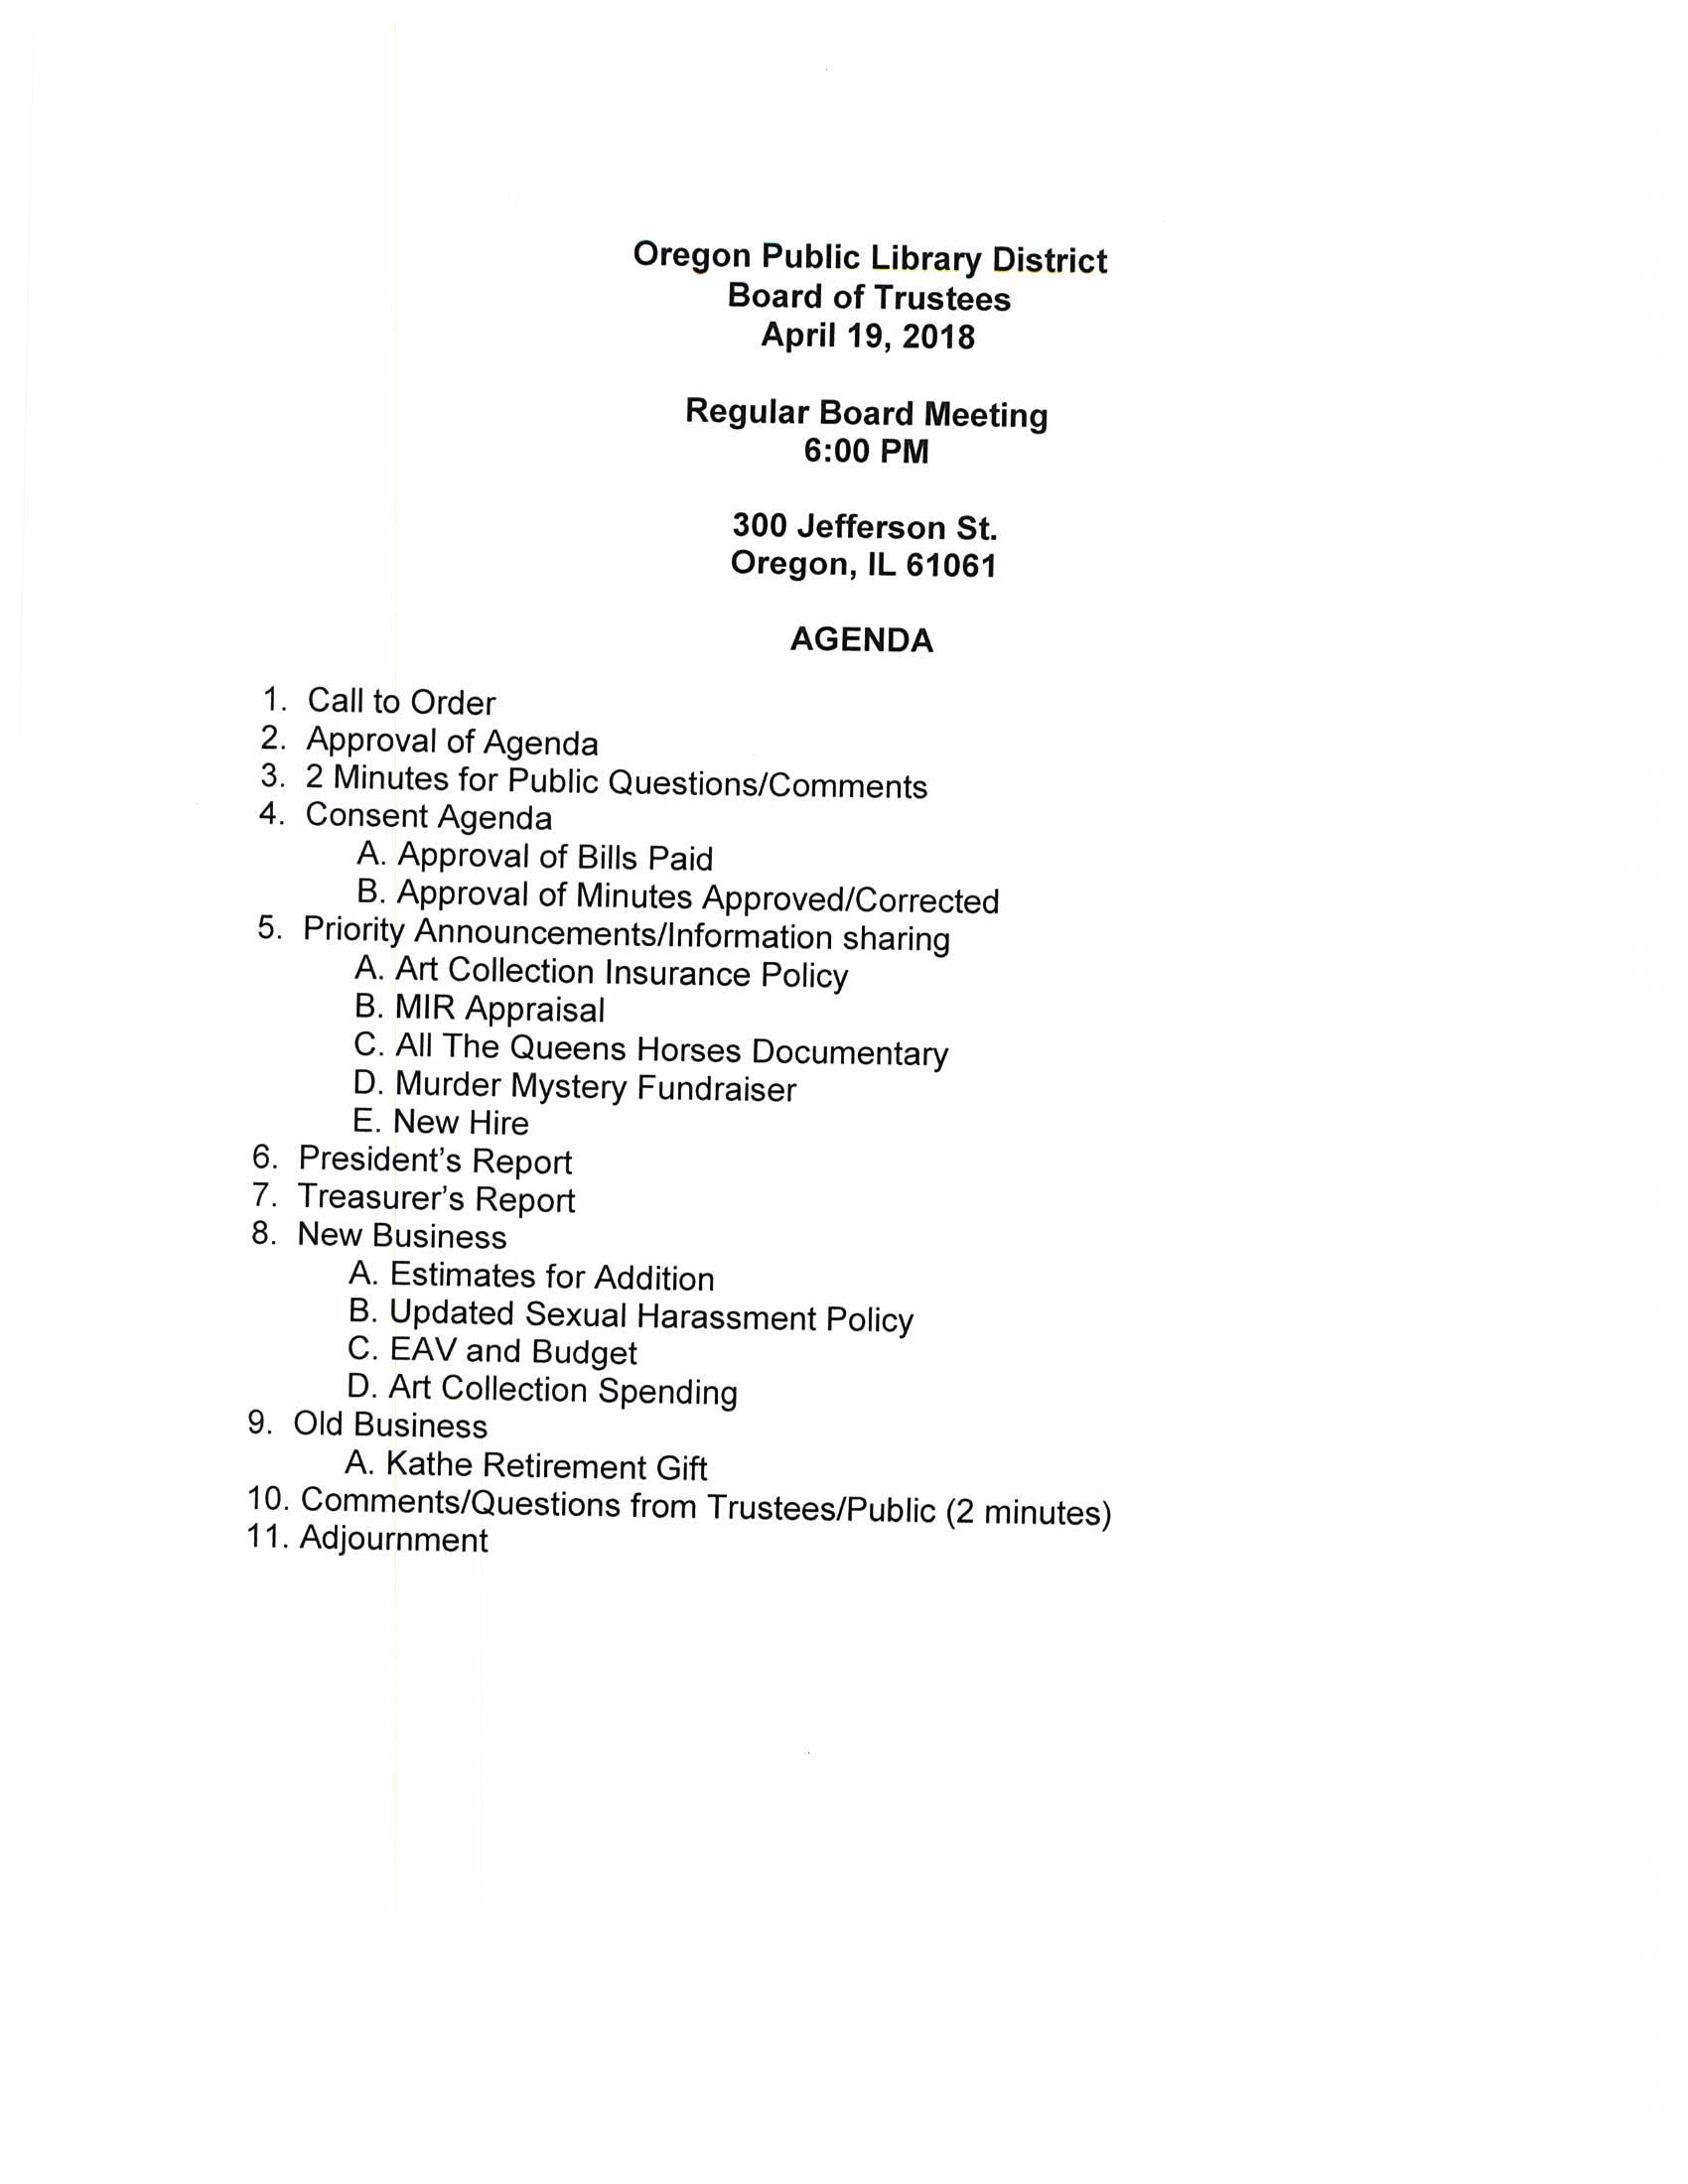 Board Meeting Agenda – Oregon Public Library District